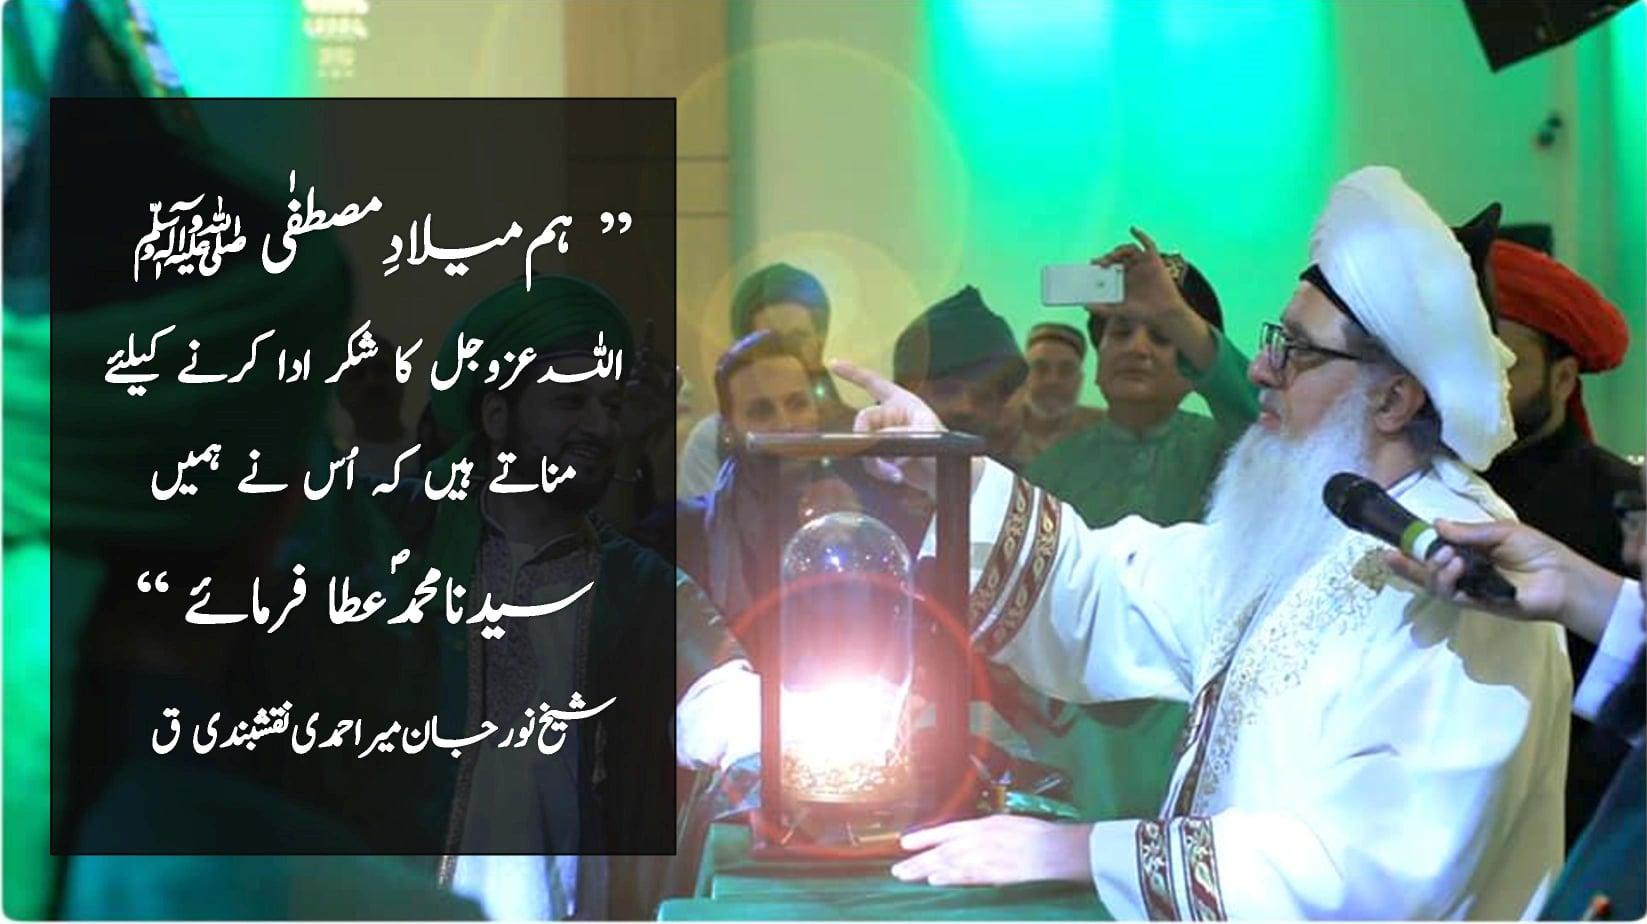 We Celebrate Mawlid un Nabi to Thank Allah (AJ) for Prophet (saws):  ہم میلاد ال...